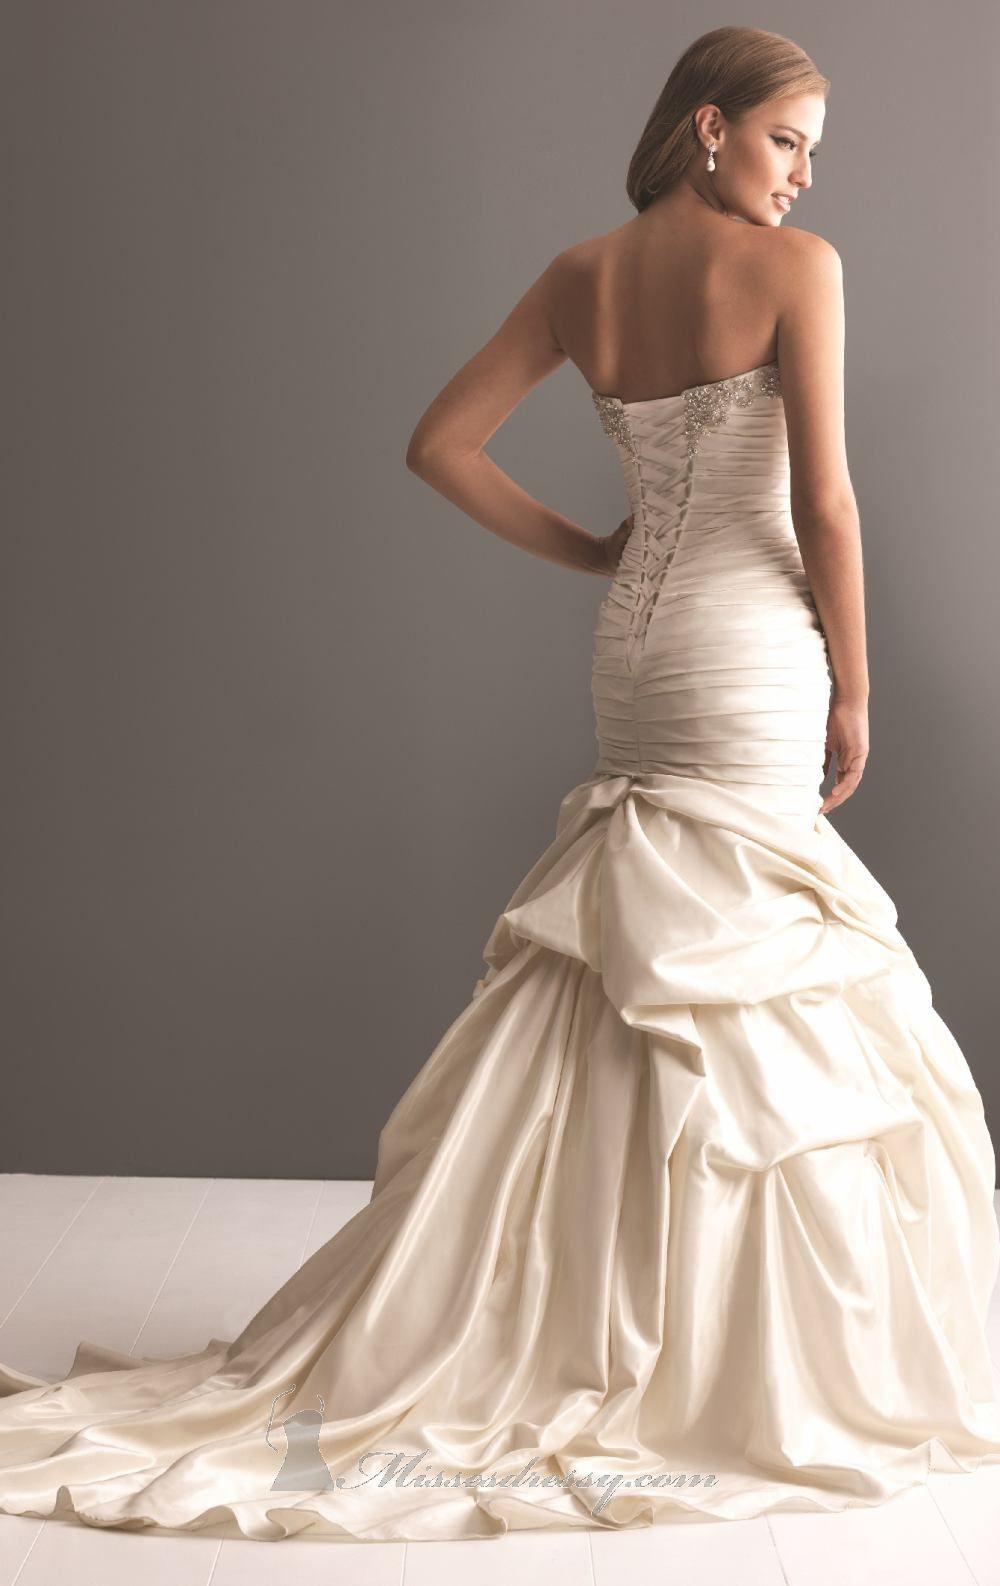 Allure 2601 by Allure Bridals Romance